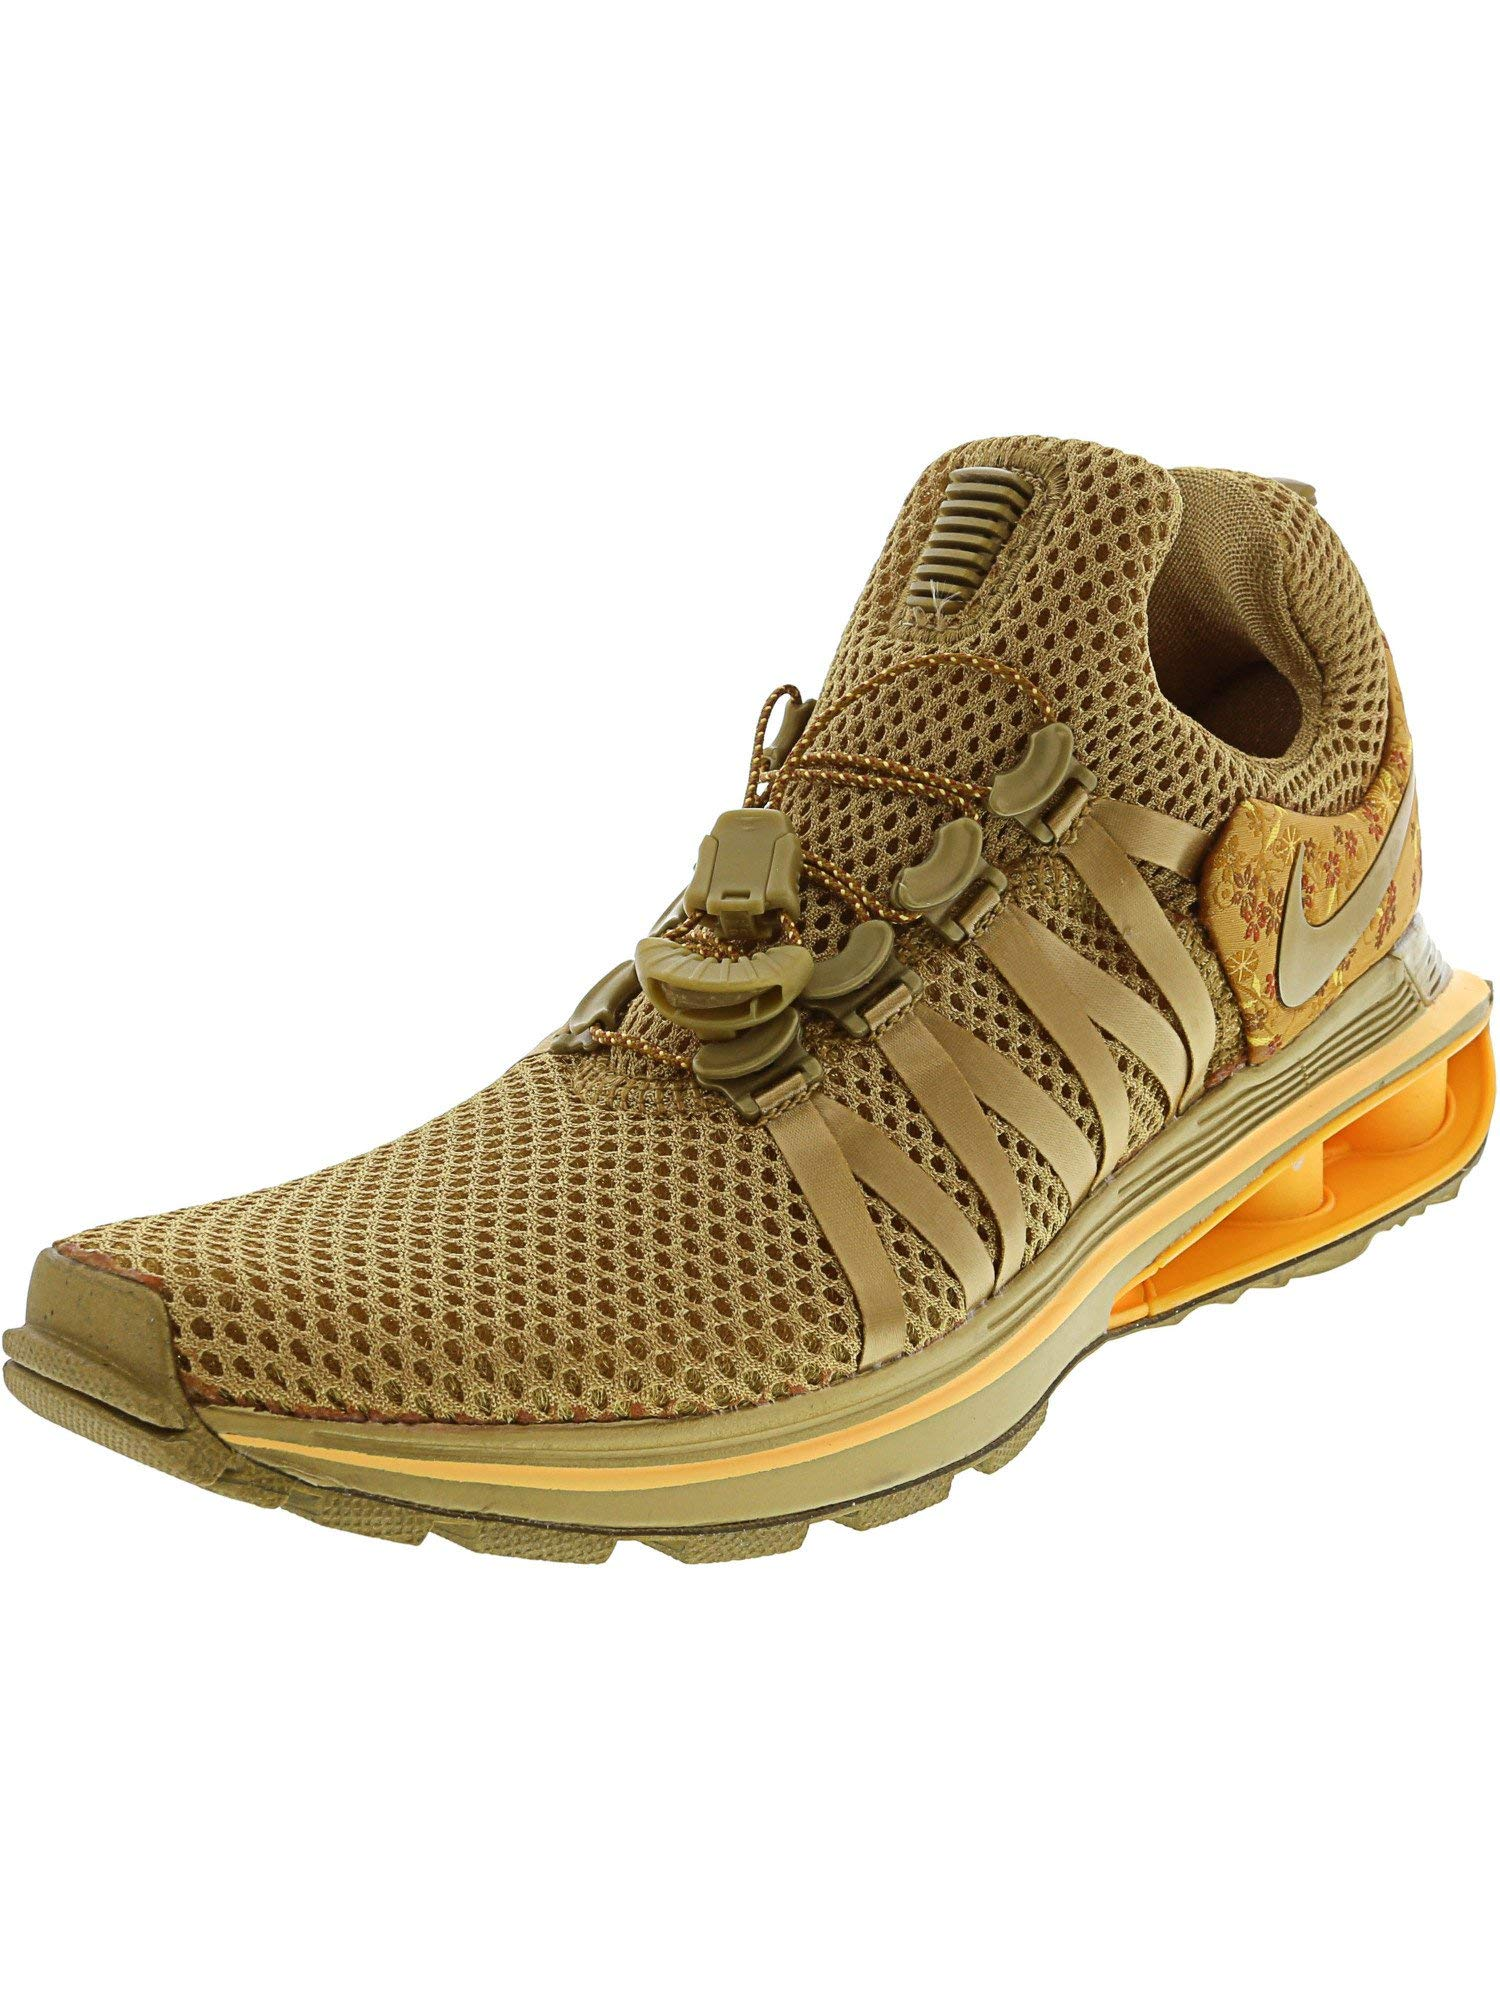 Nike Womens Shox Gravity Metallic Gold Running Shoe AQ8854-700 (7 B(M) US)